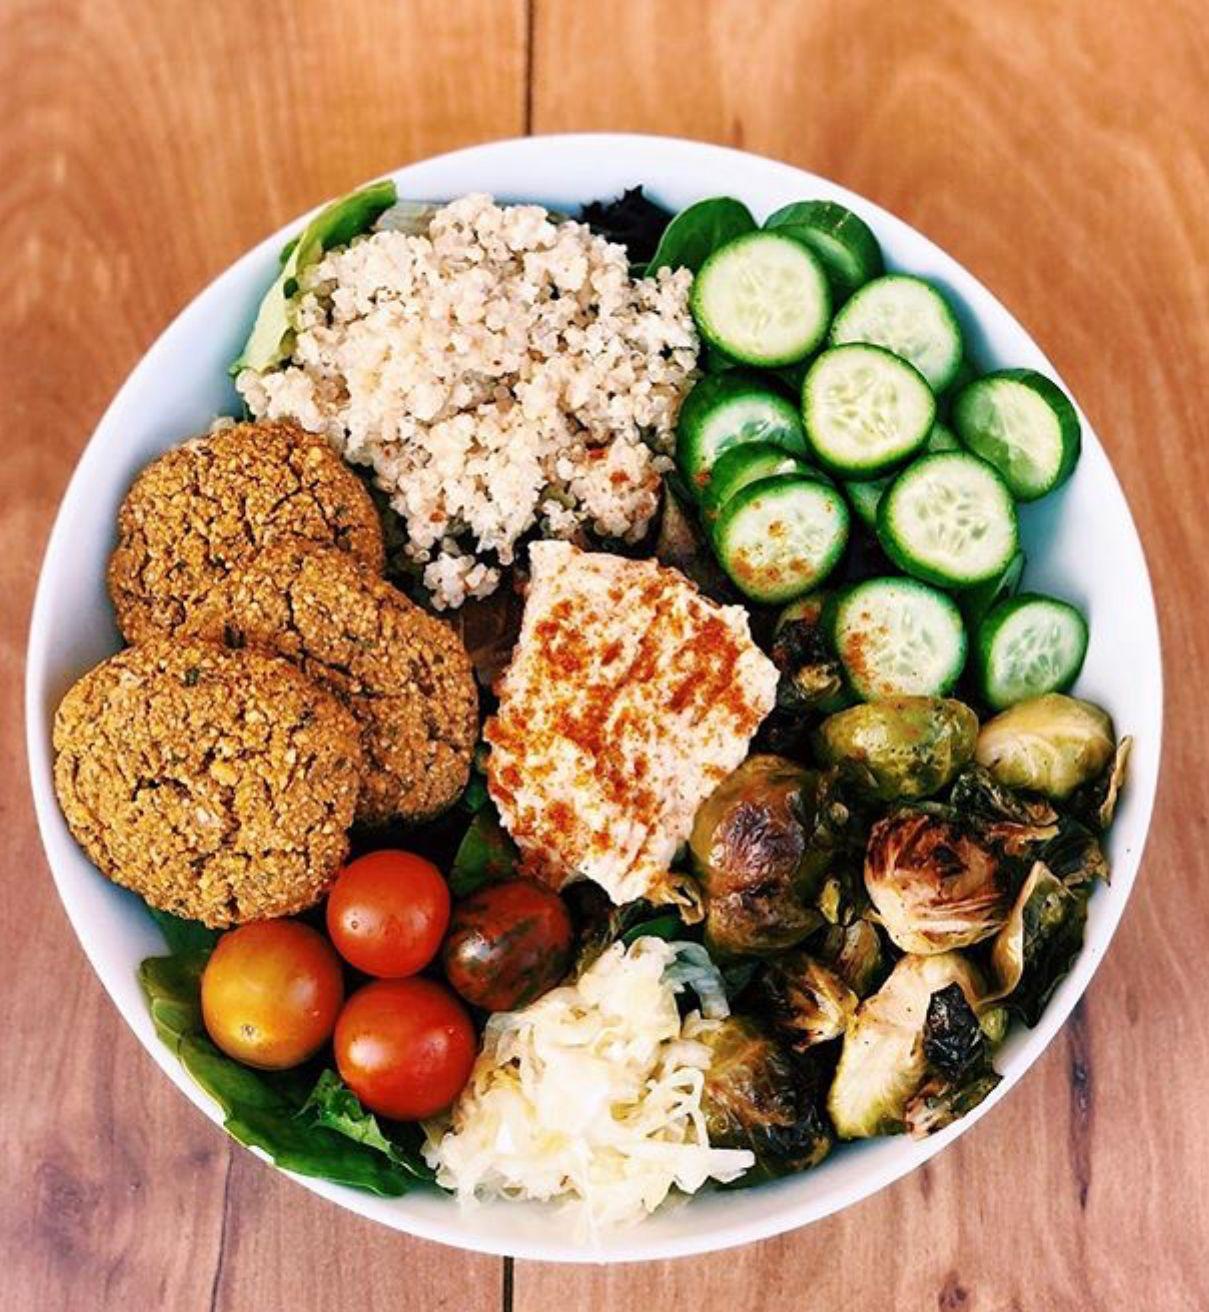 Health food recipes vegetarian